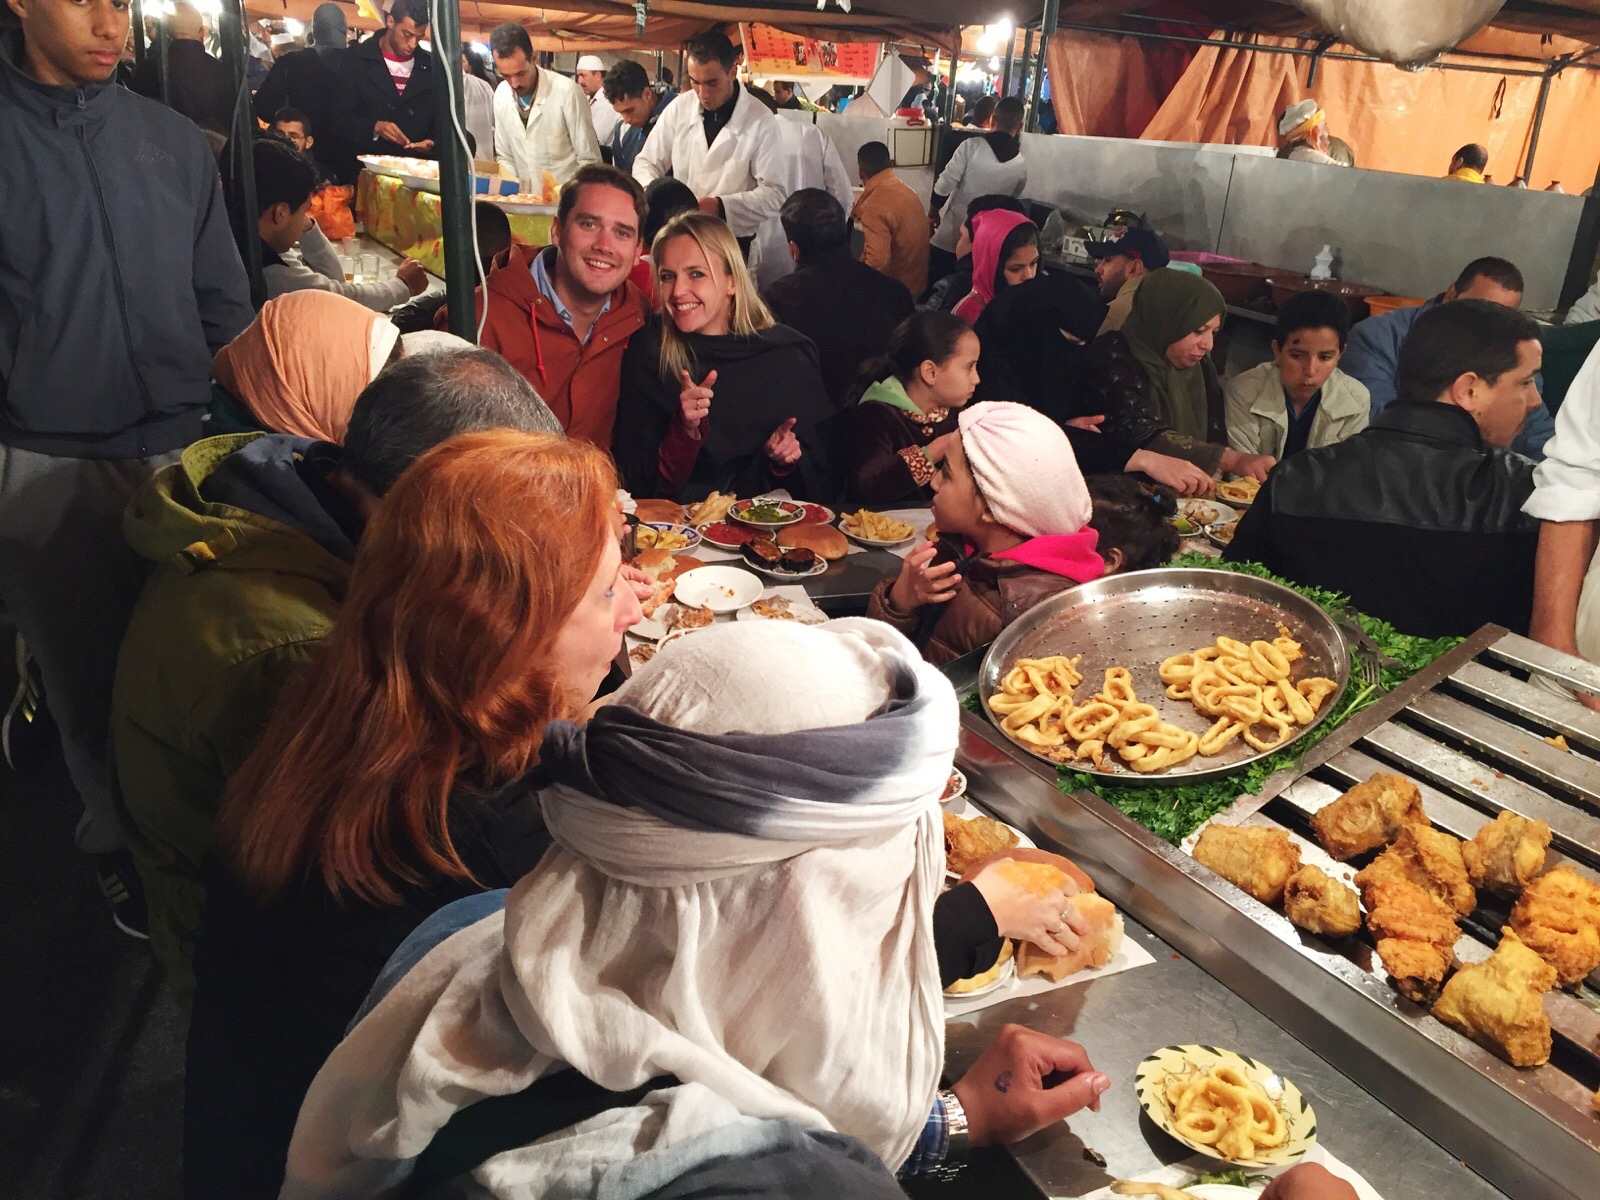 Bag-at-you---Fashion-blog---Postcard-from-Marrakesh---Dinner-at-El-Fna